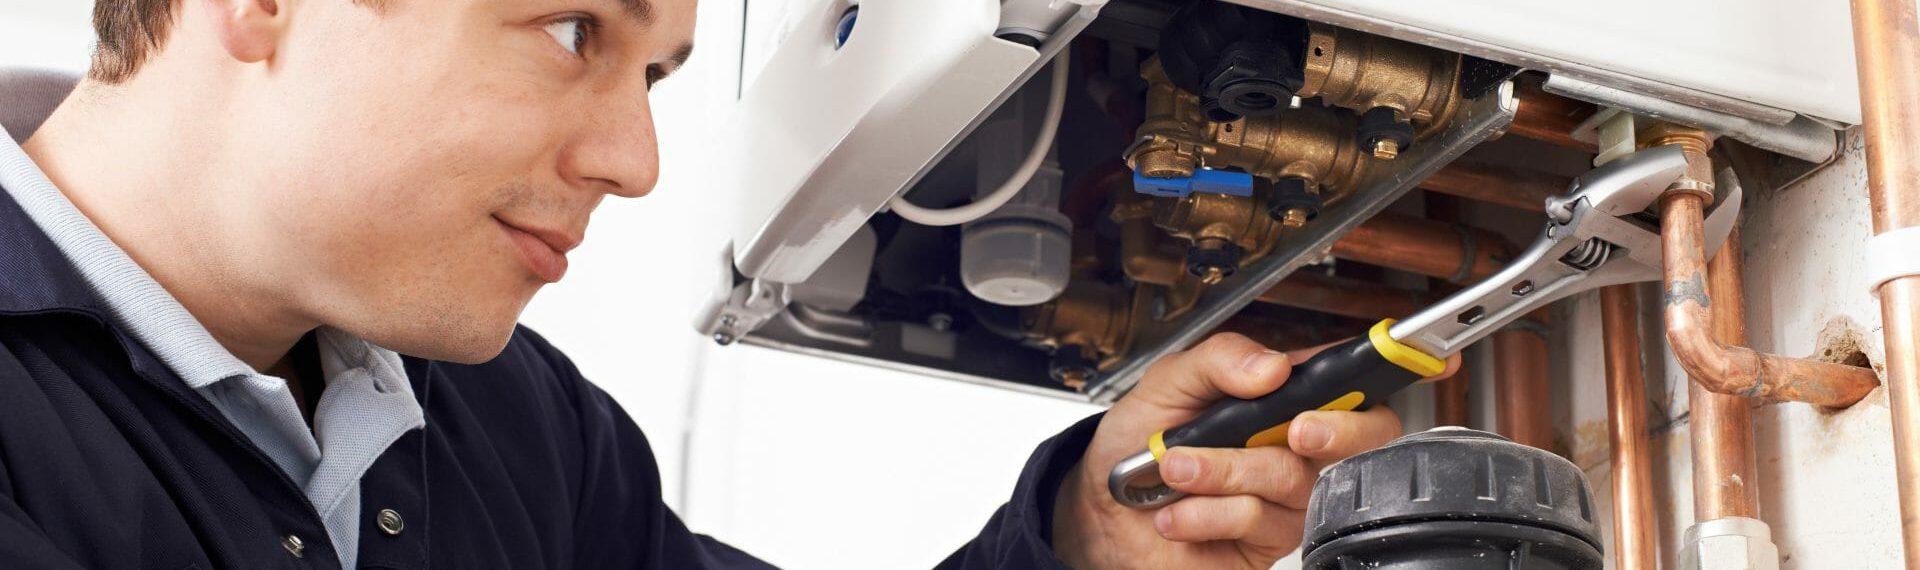 Heating Engineer's Insurance: Explained